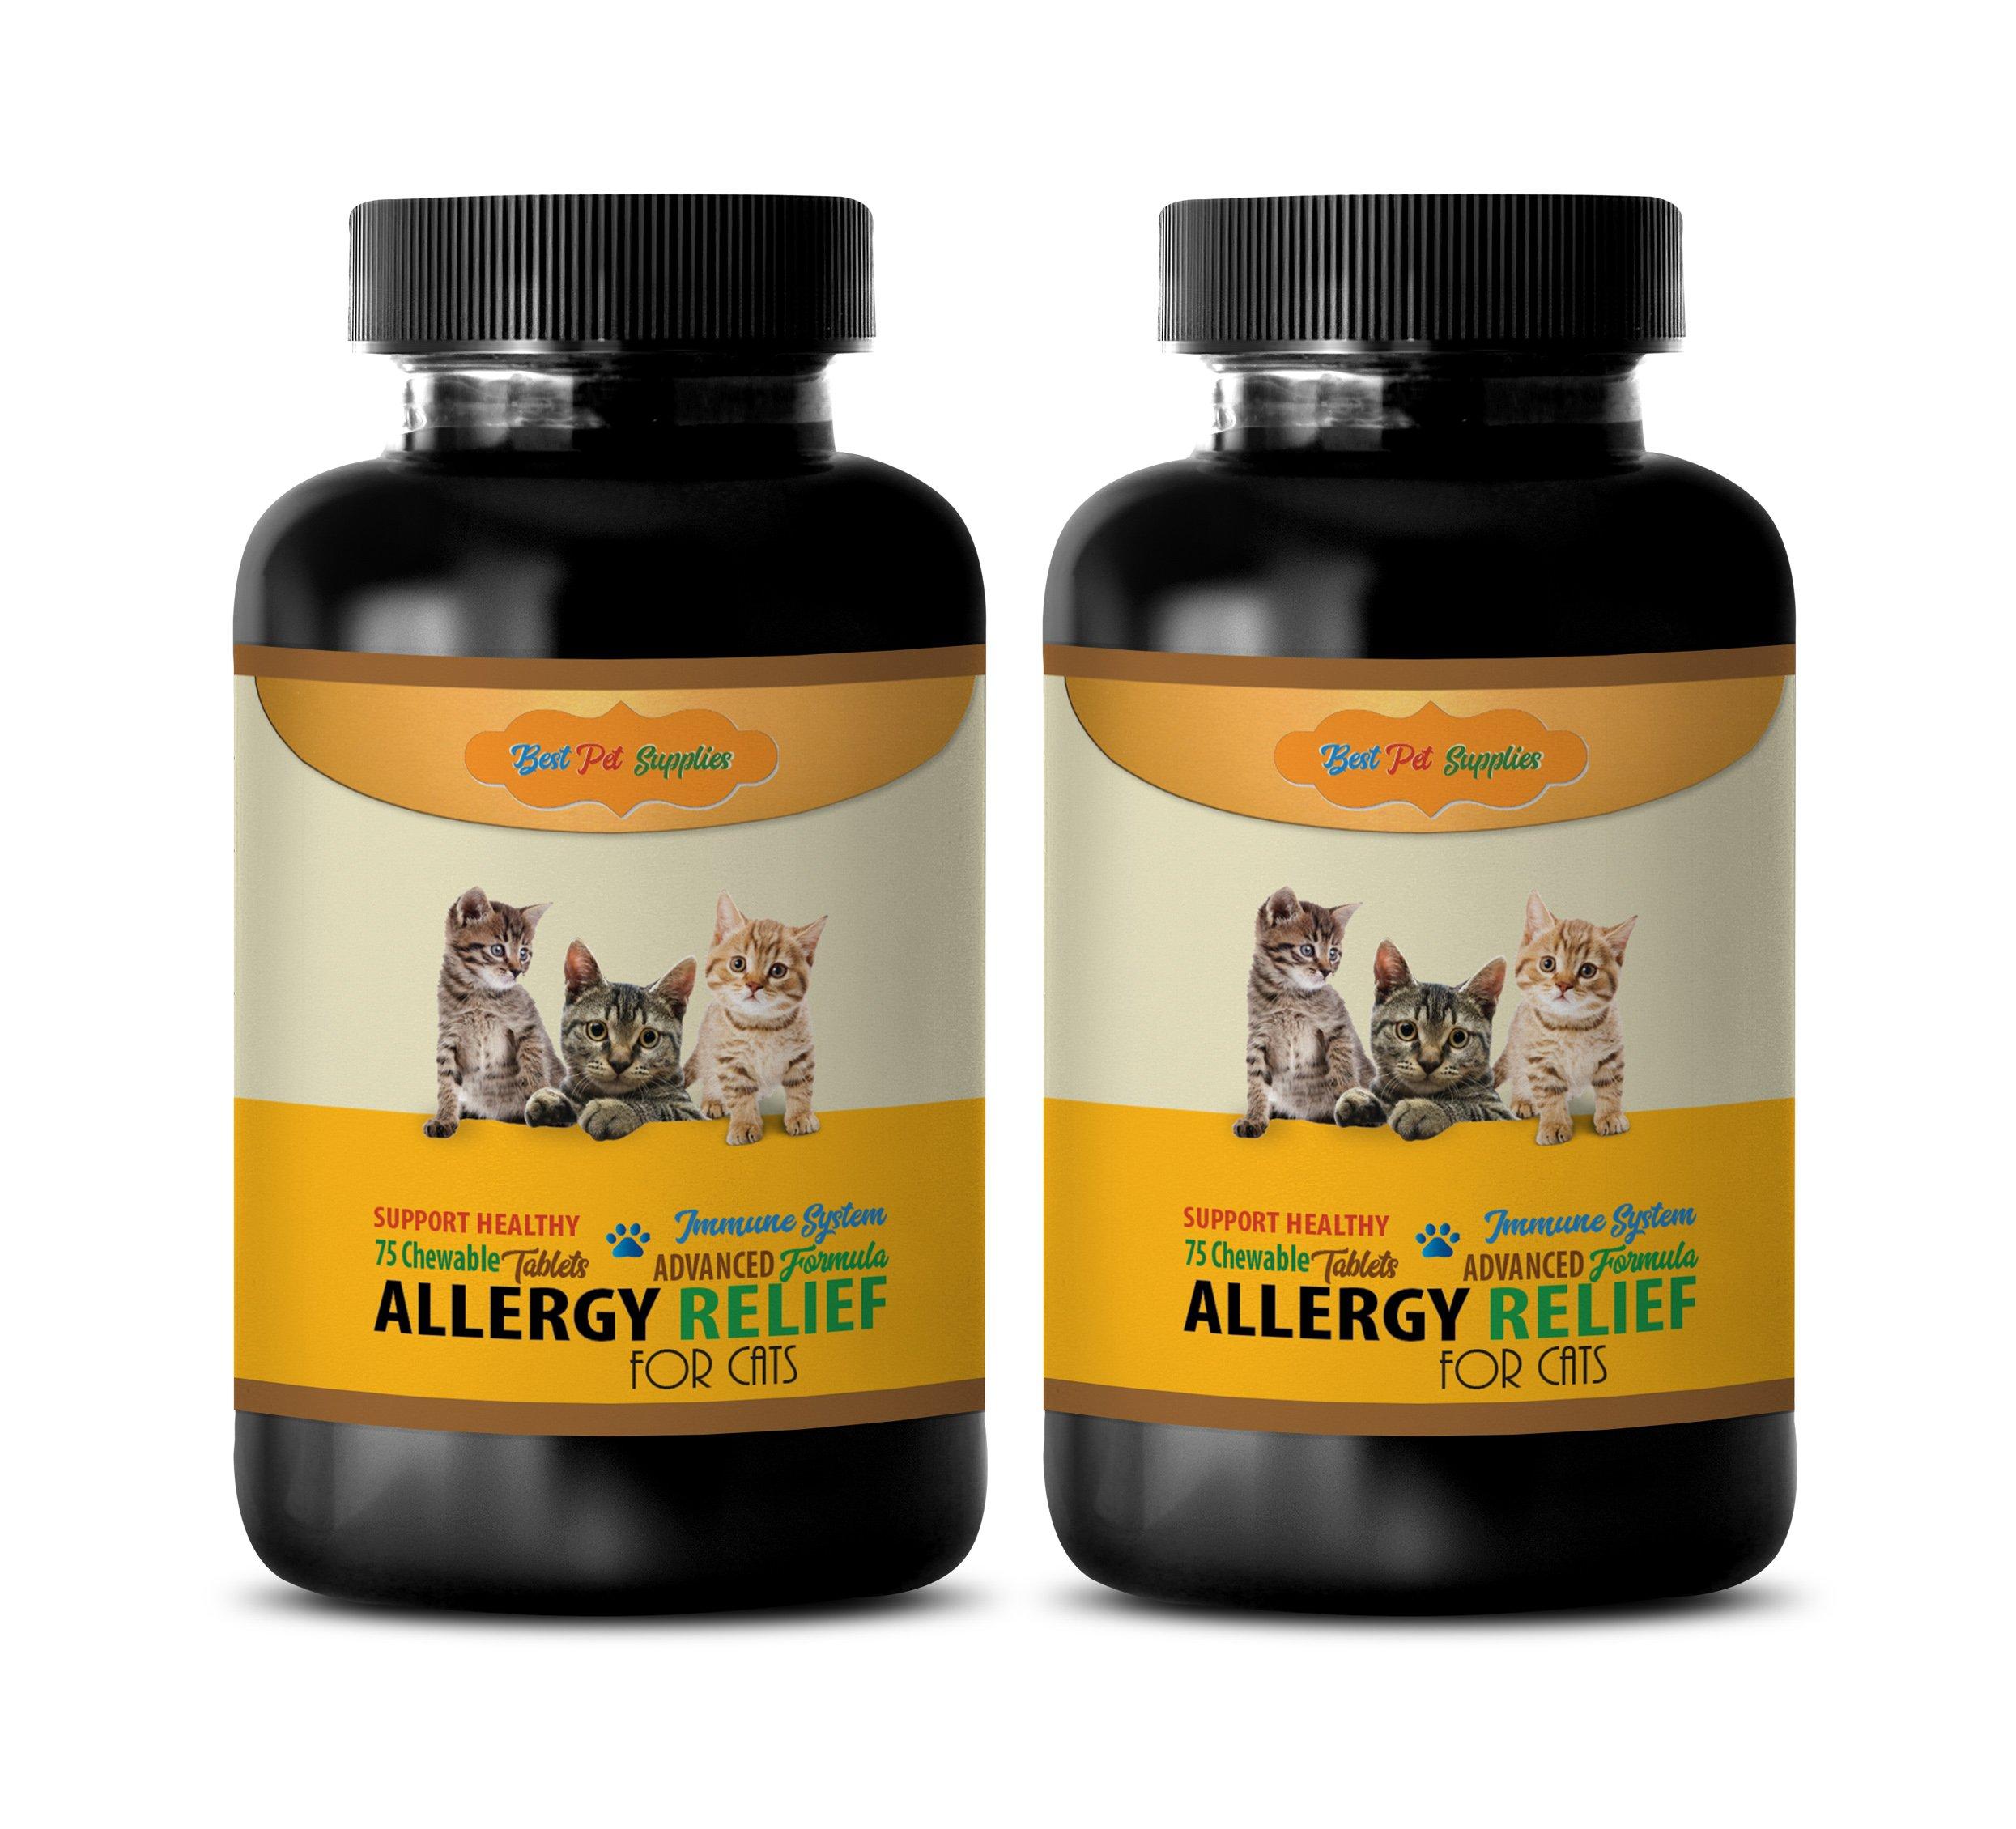 BEST PET SUPPLIES LLC cat allergen reducer - HEALTHY ALLERGY RELIEF - FOR CATS - ADVANCED IMMUNE SUPPORT FORMULA - CHEWABLE - cat immune system boost - 150 Chews (2 Bottle) by BEST PET SUPPLIES LLC